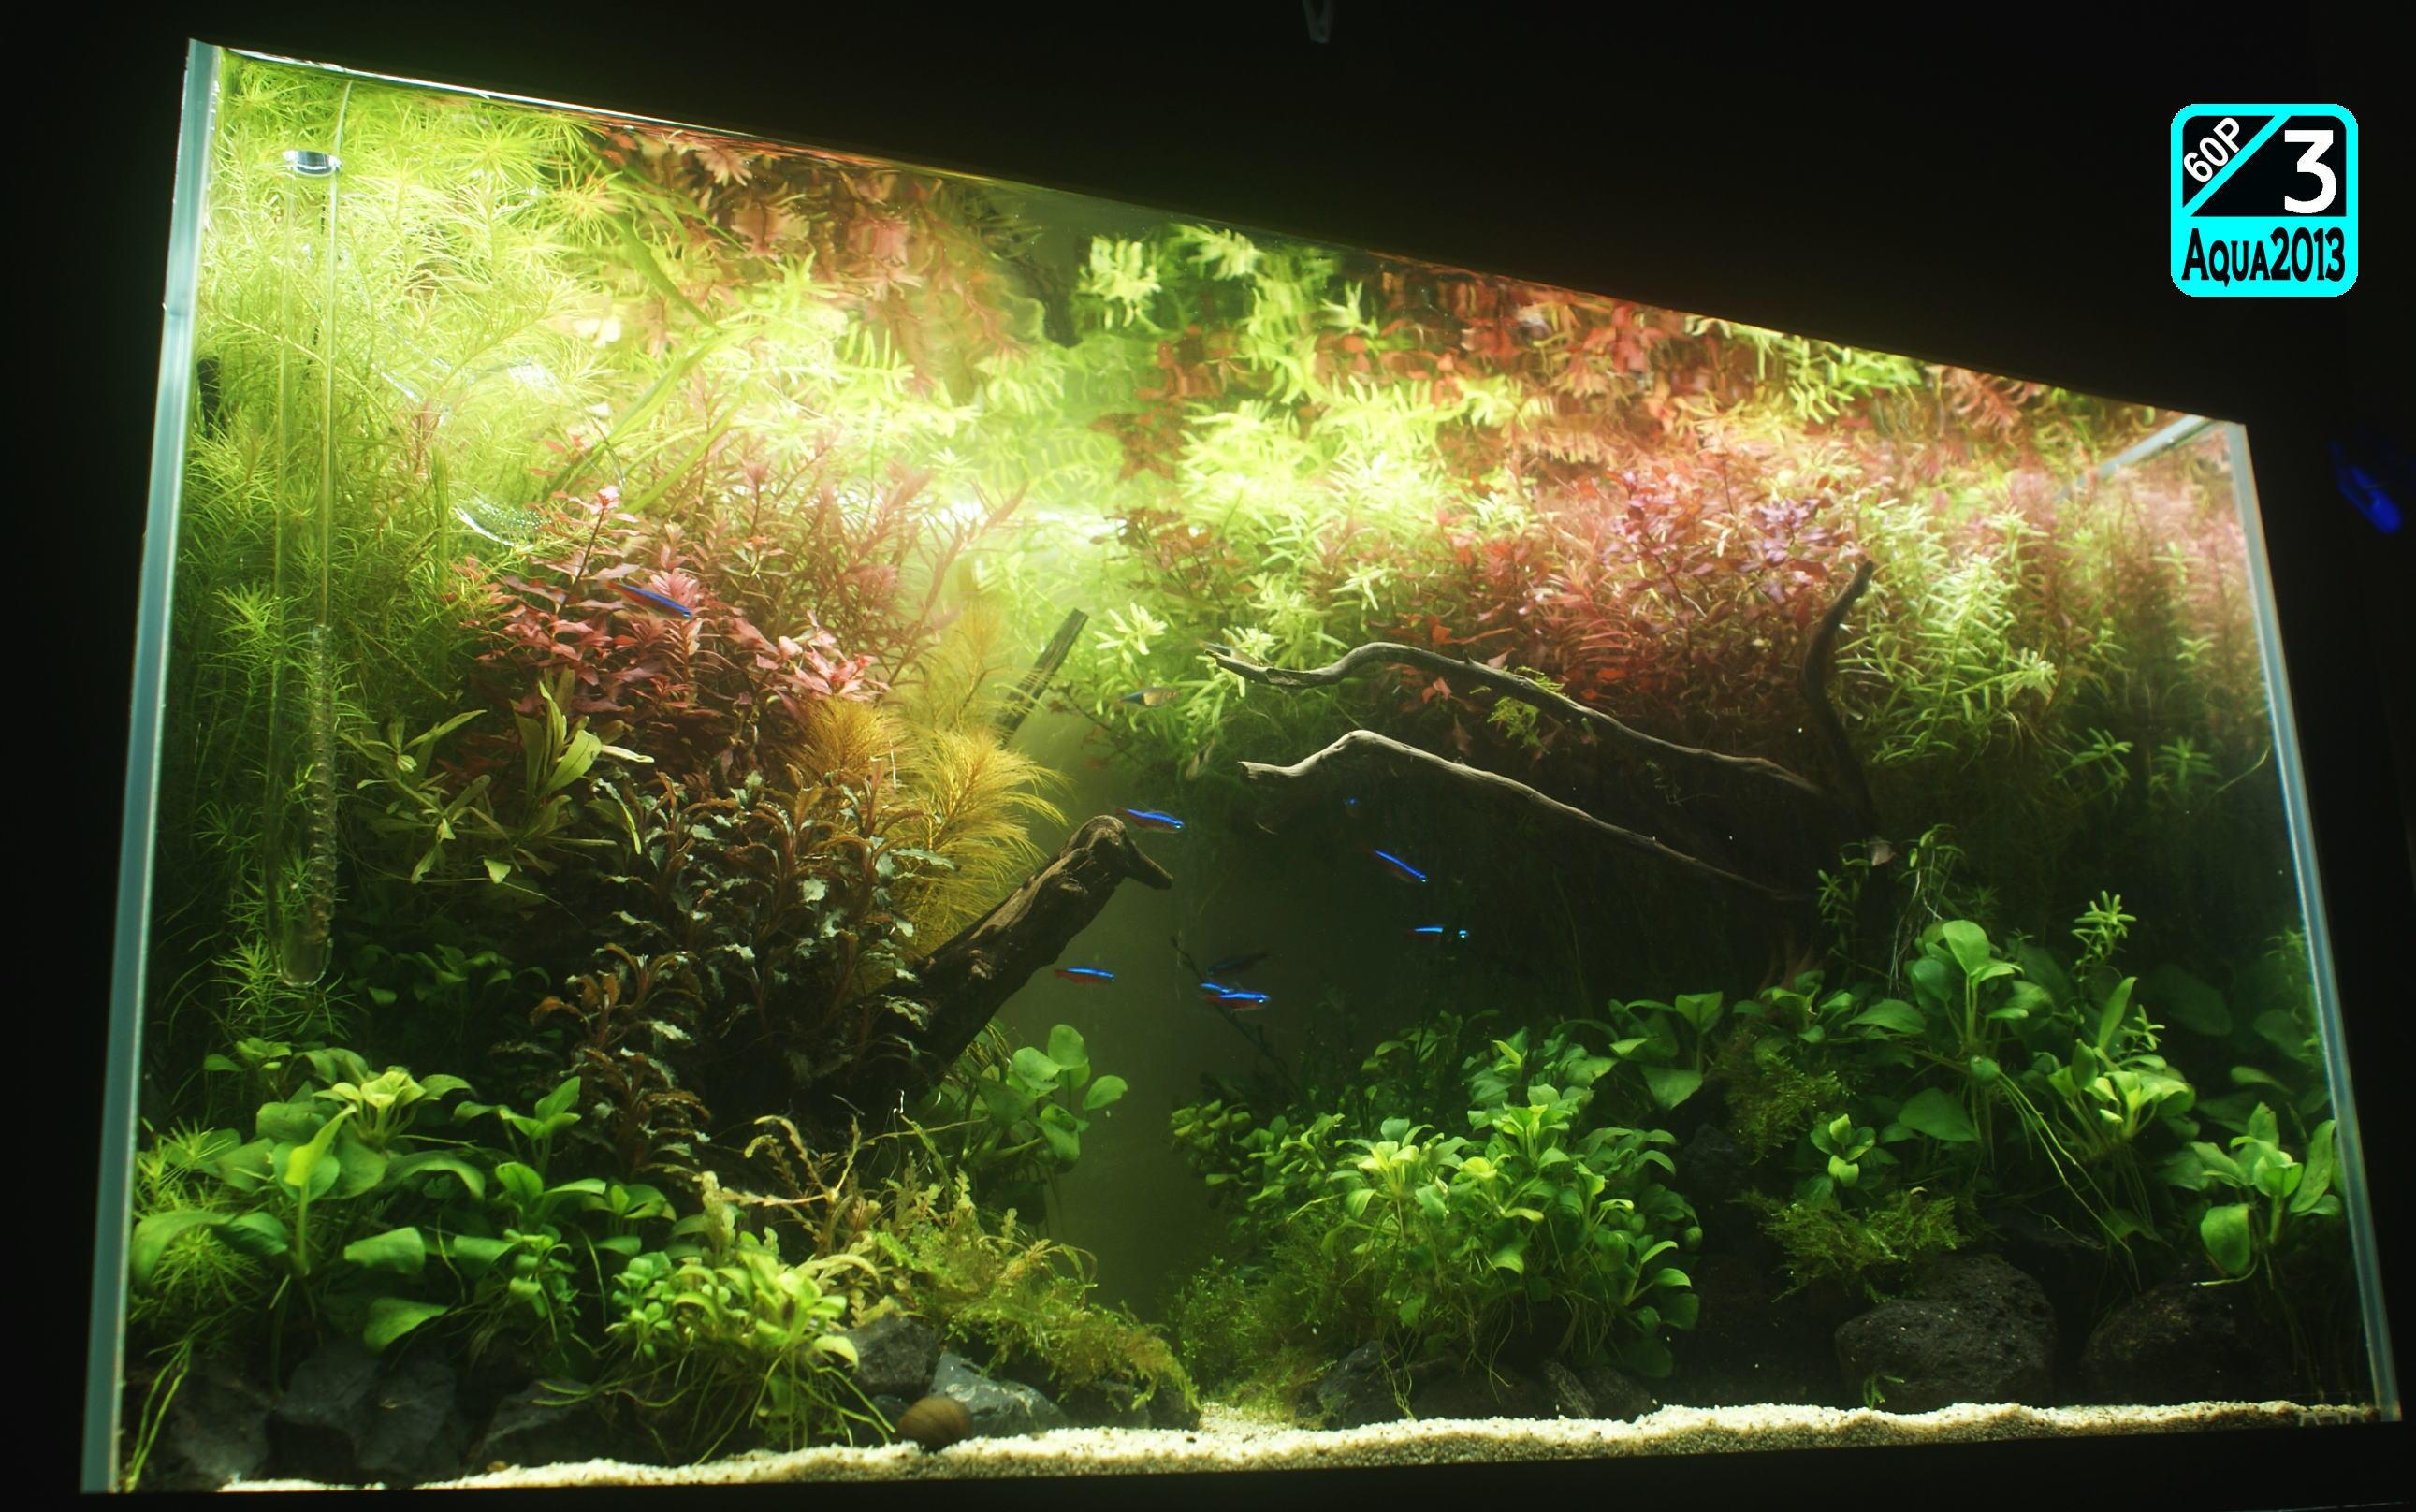 Aqua2016_1003c_009.jpg